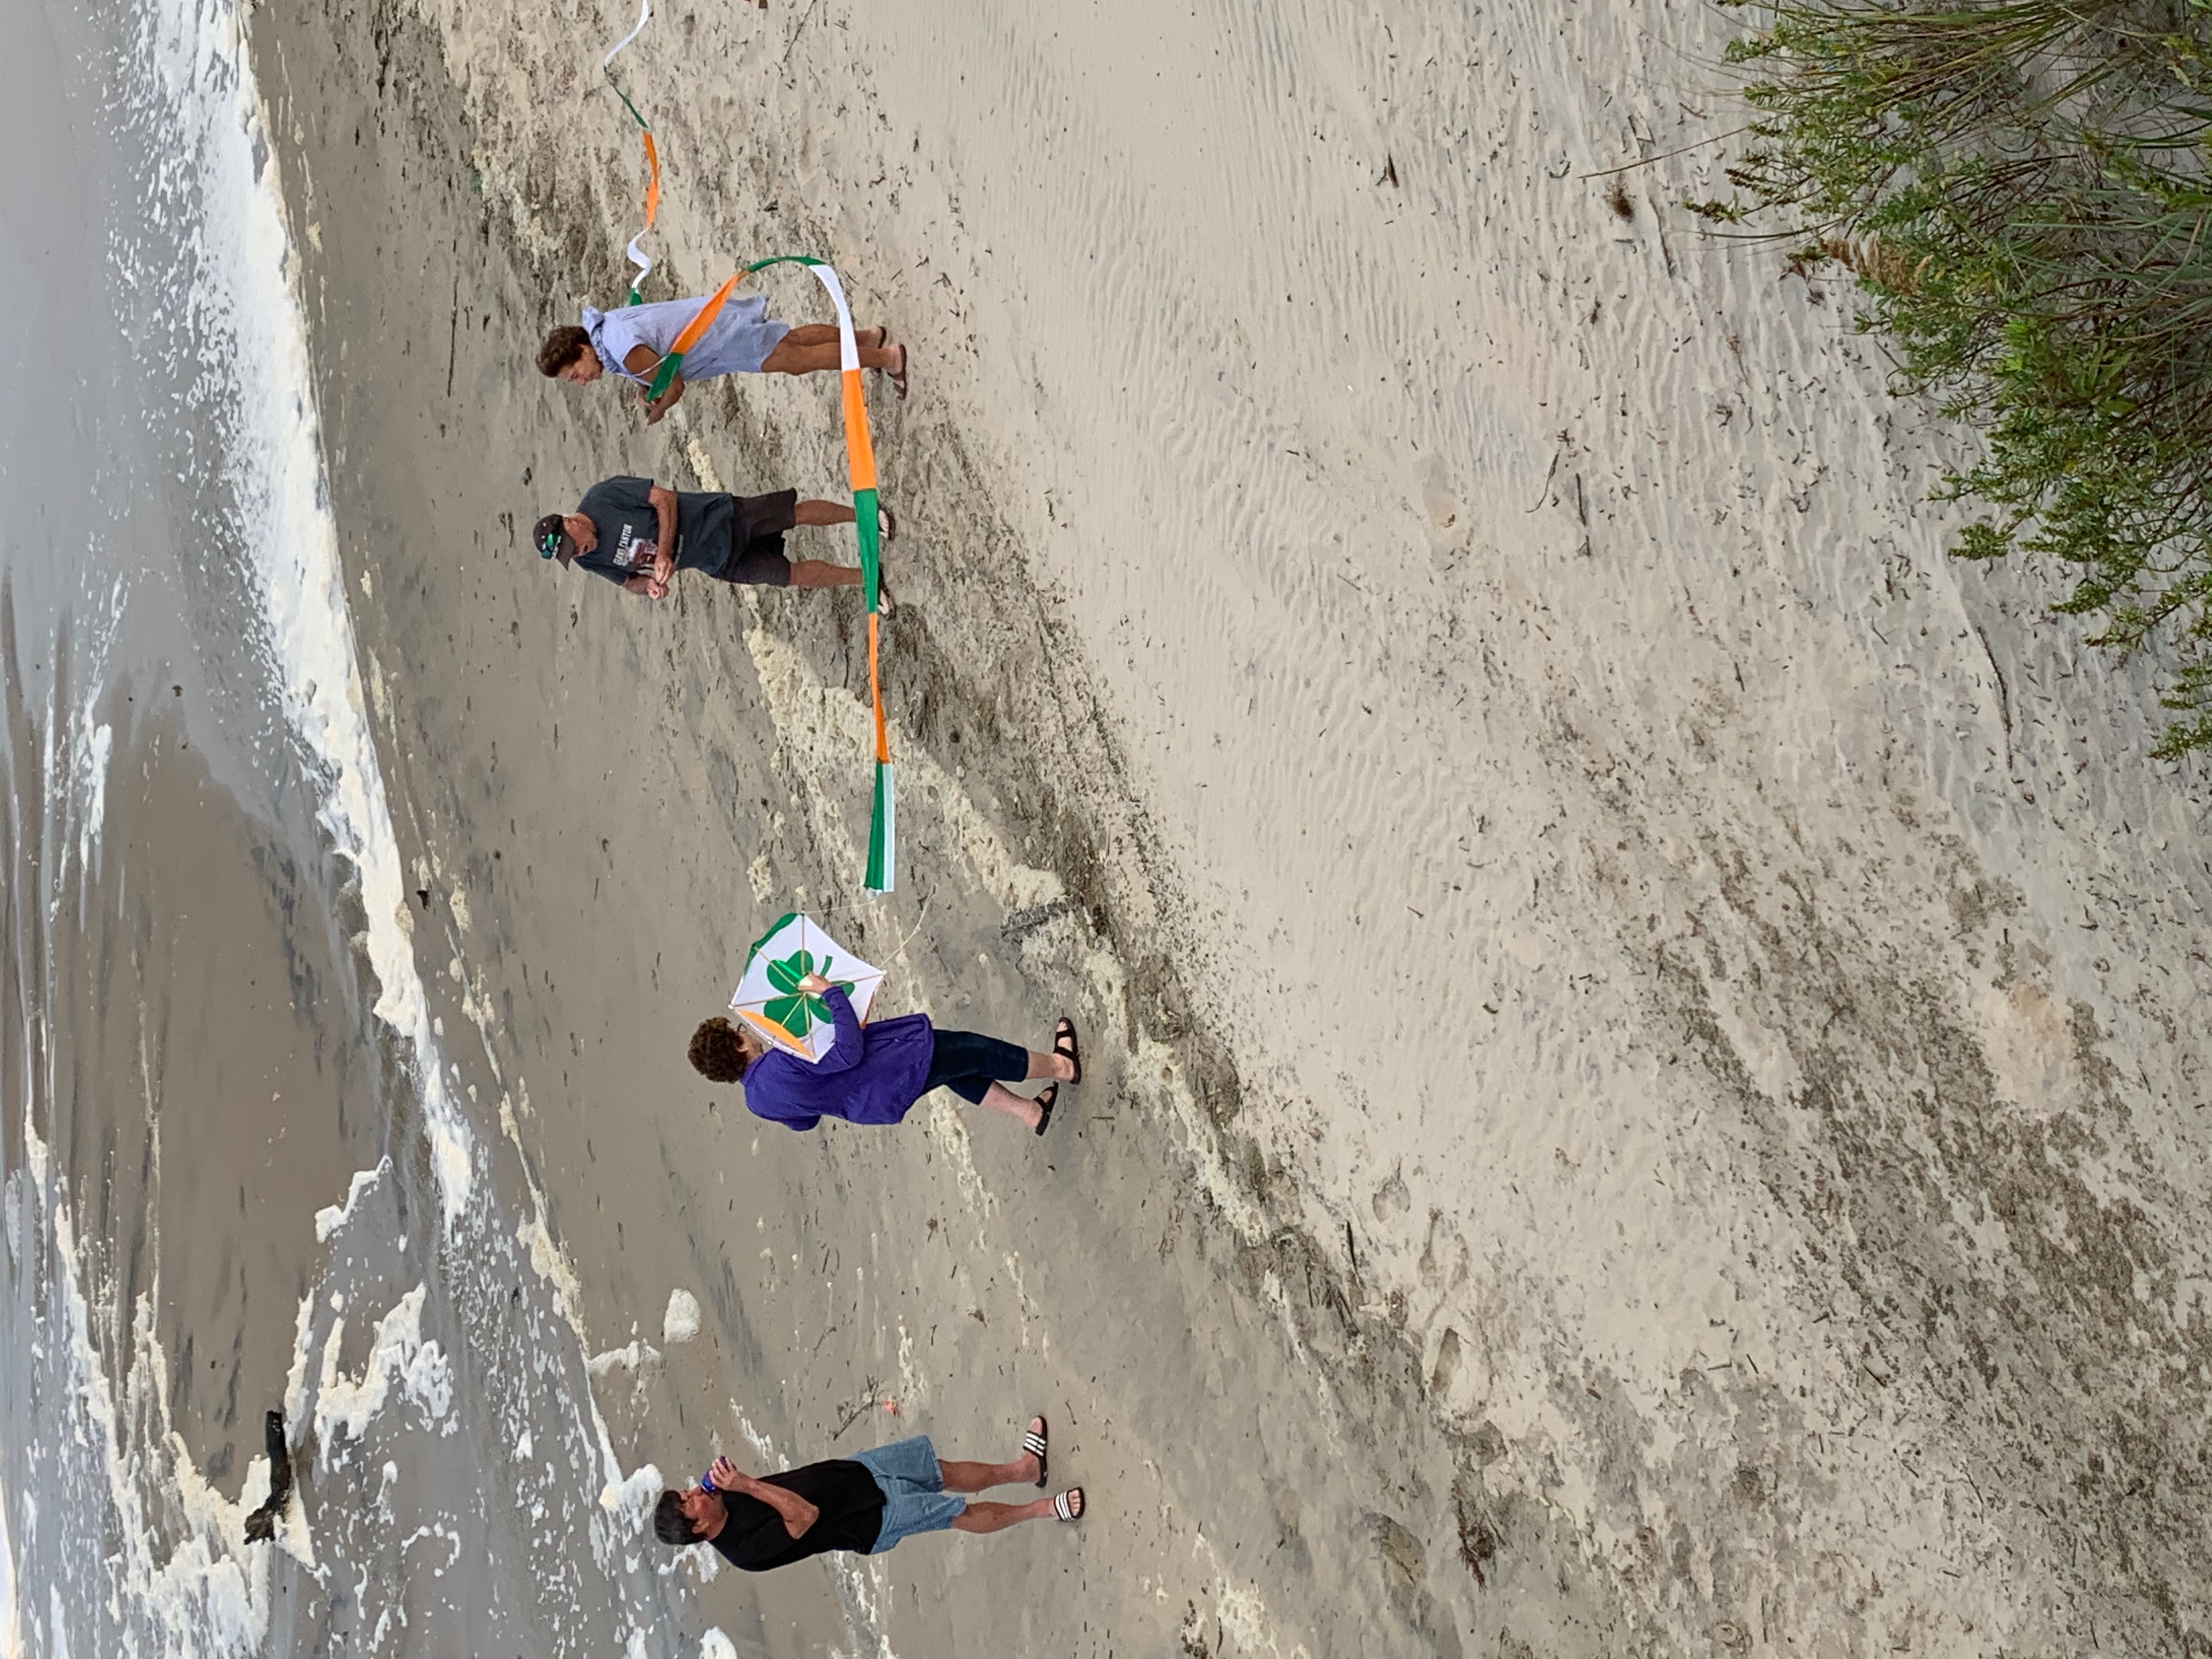 Flyringokite beach3.JPEG